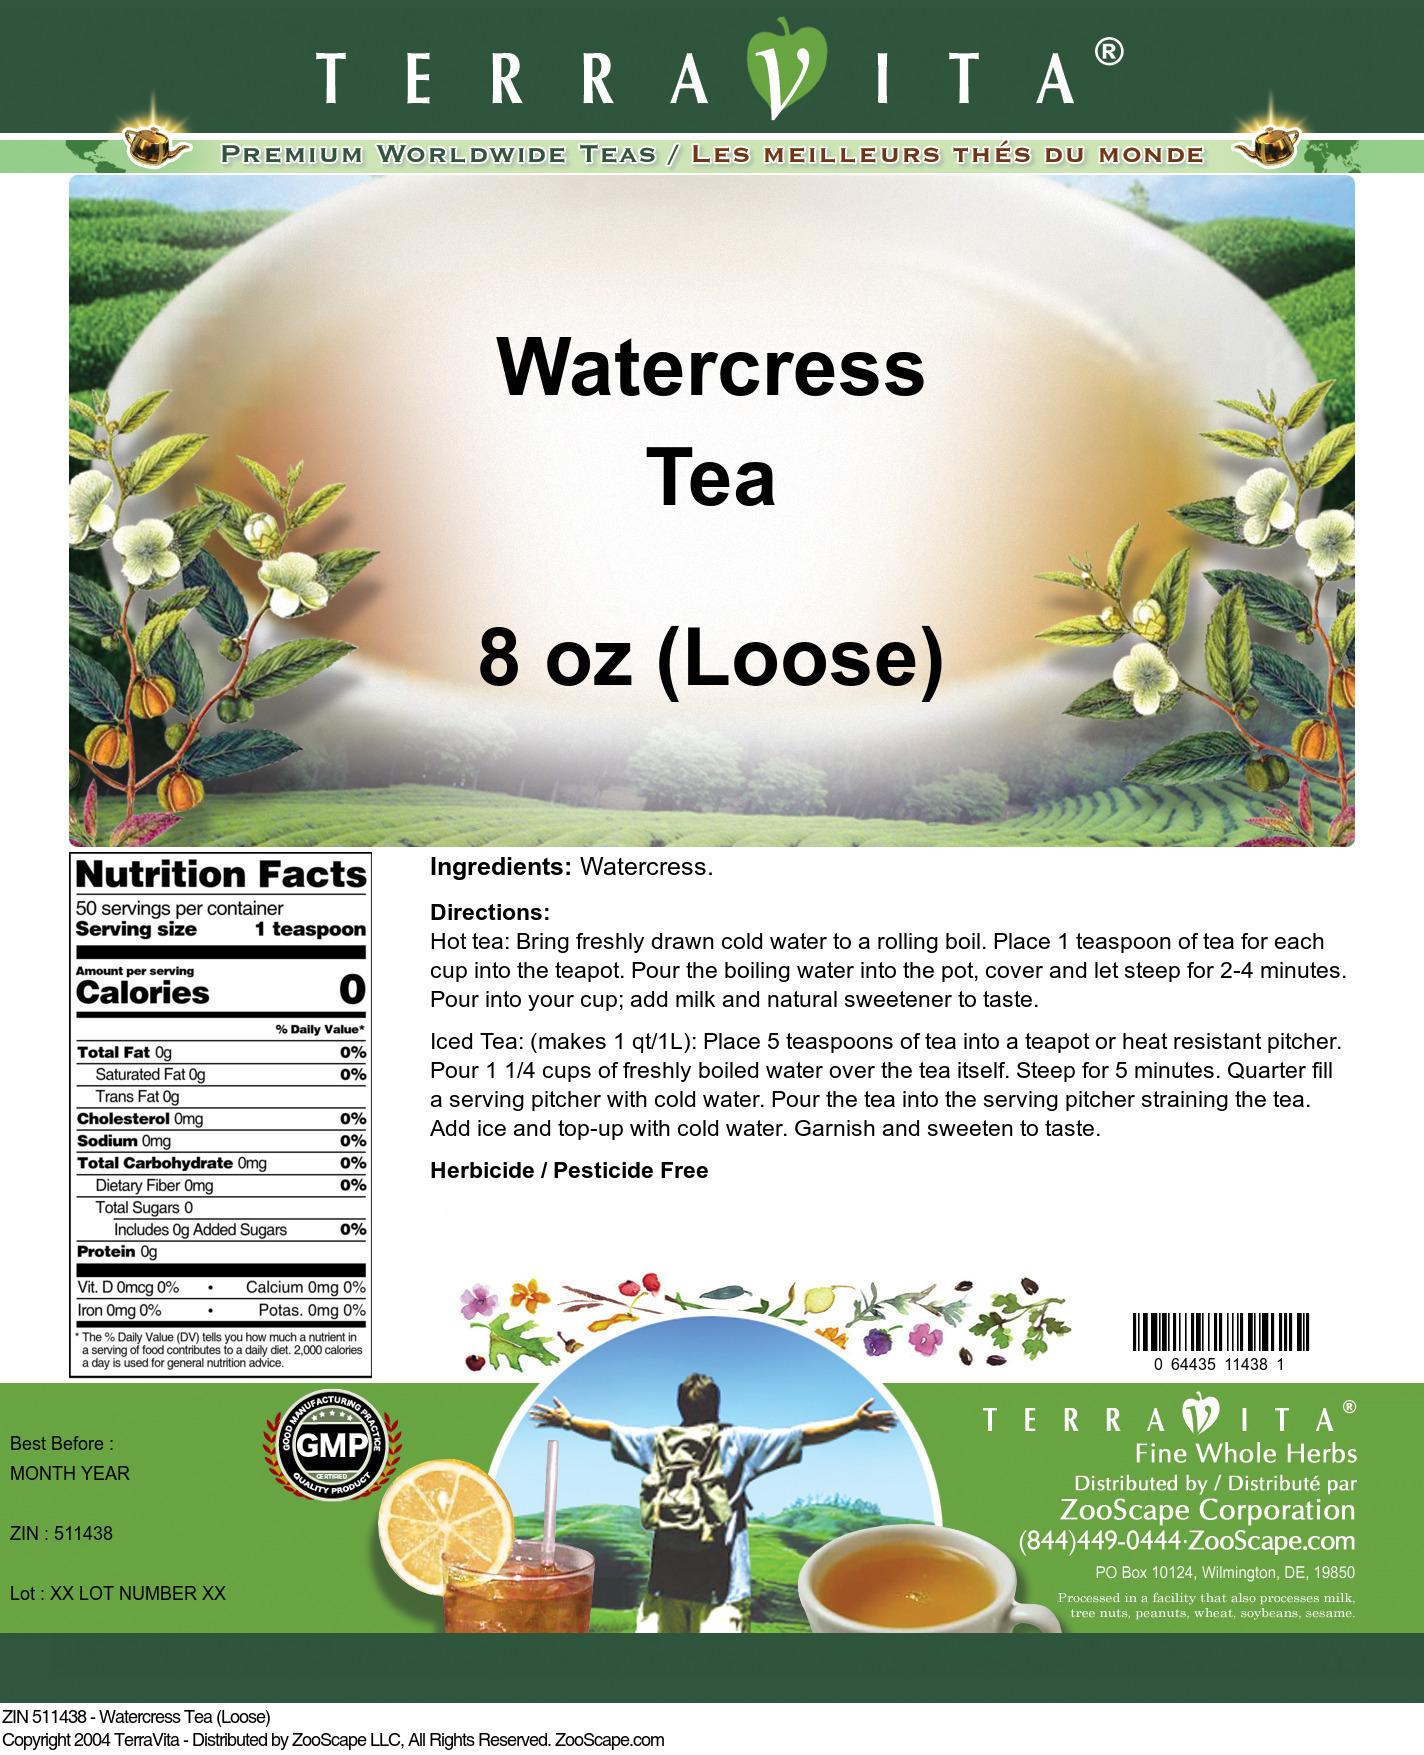 Watercress Tea (Loose)